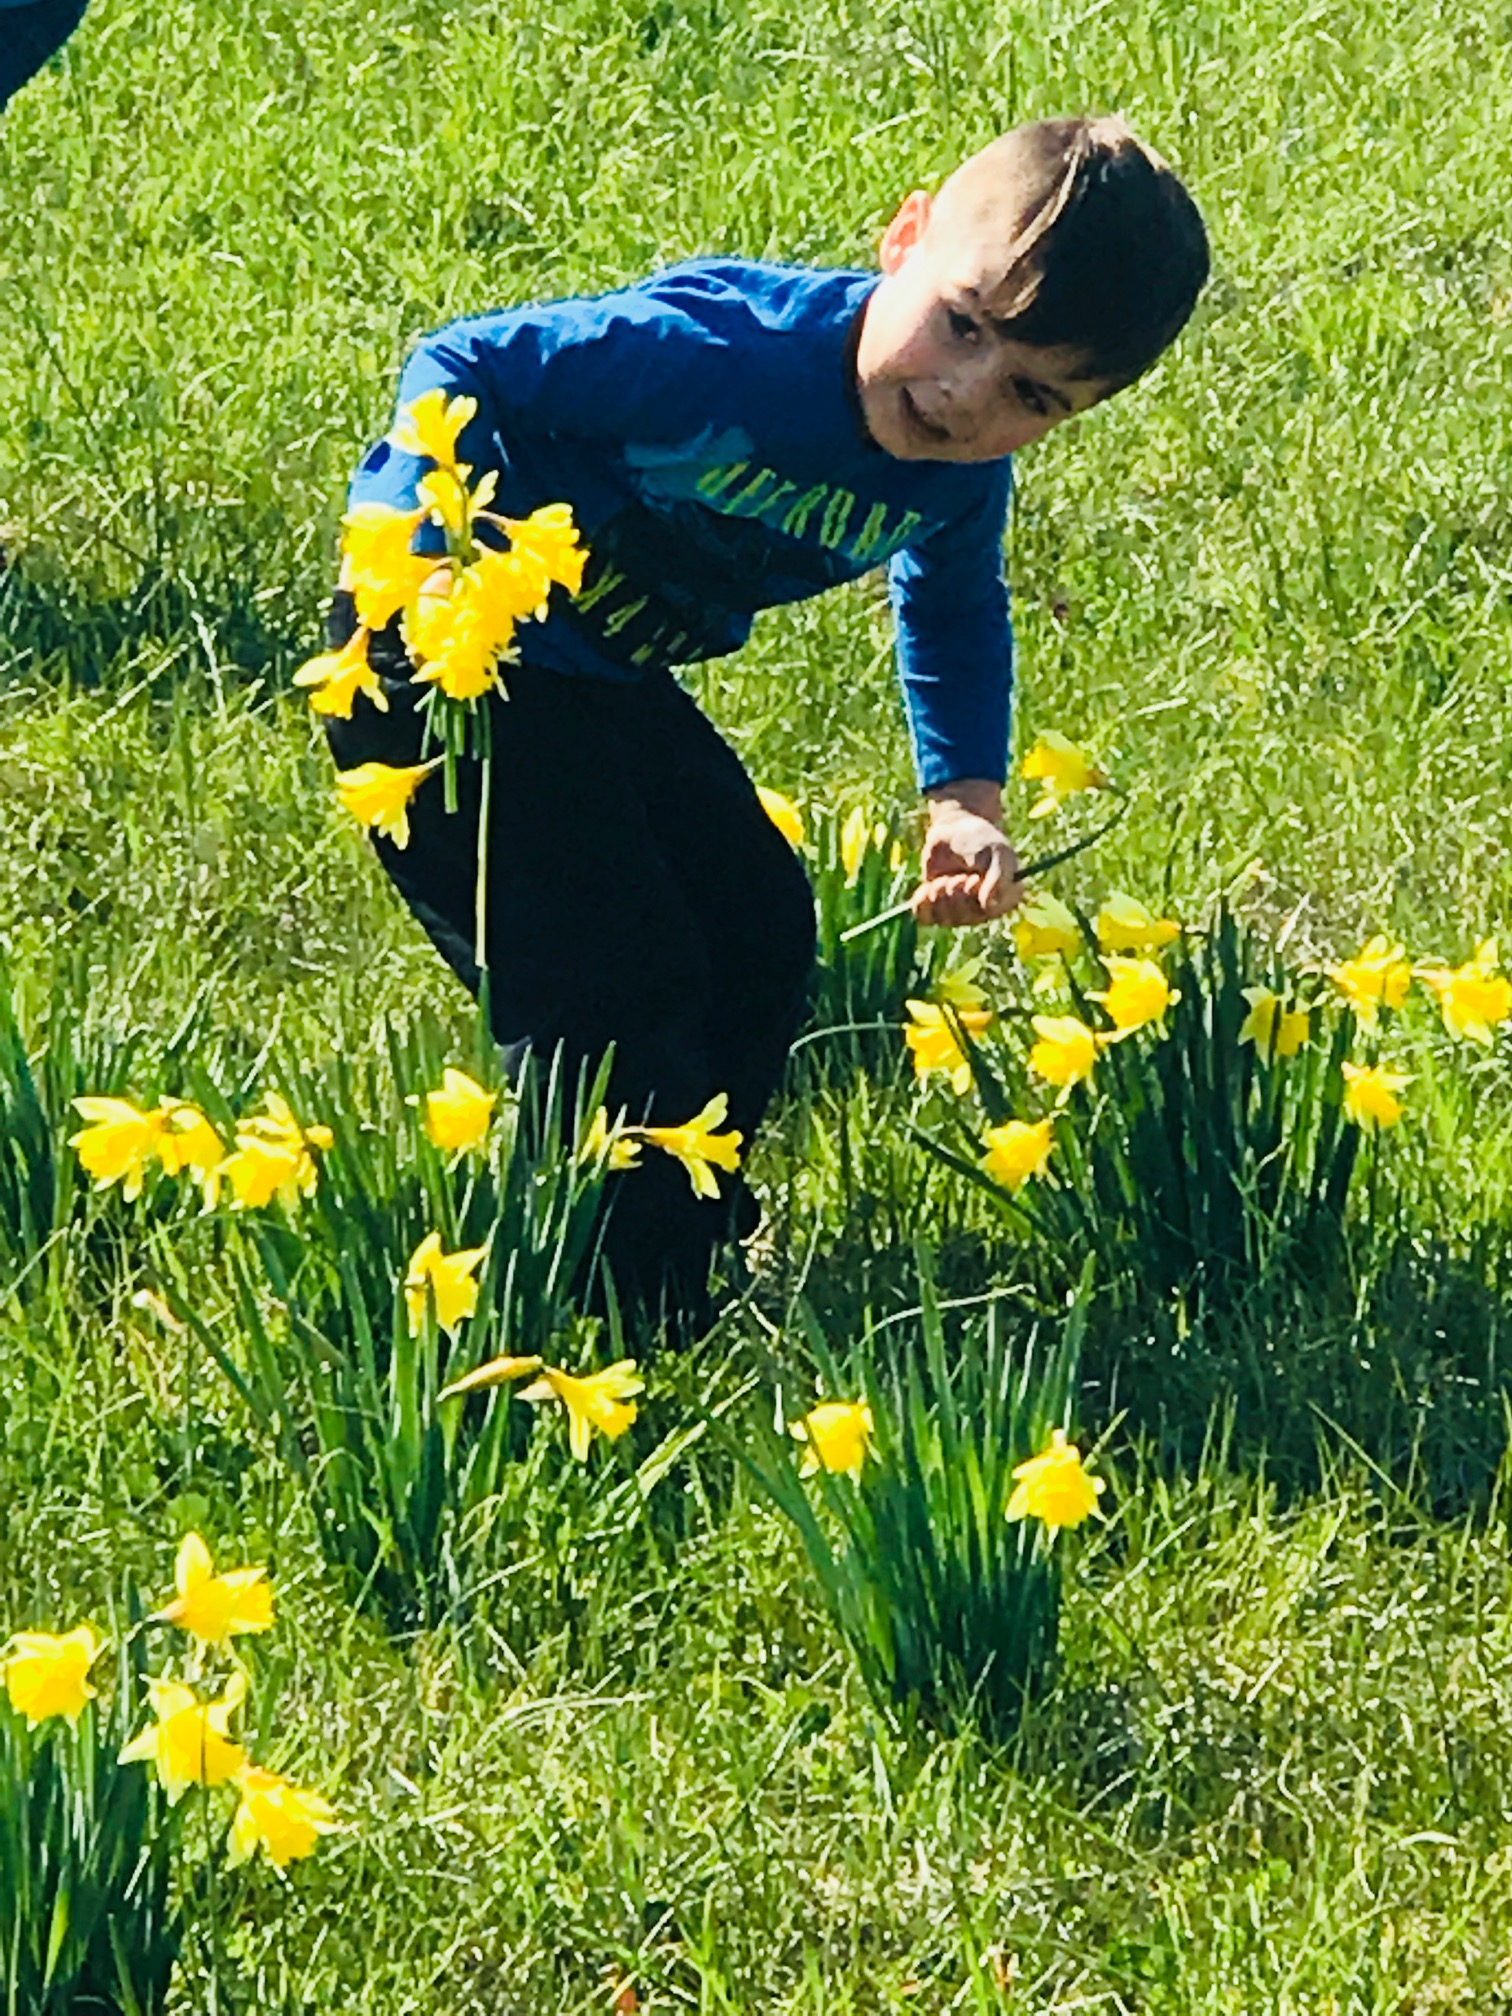 Picking Daffodils With Grandchildren - Nanahood